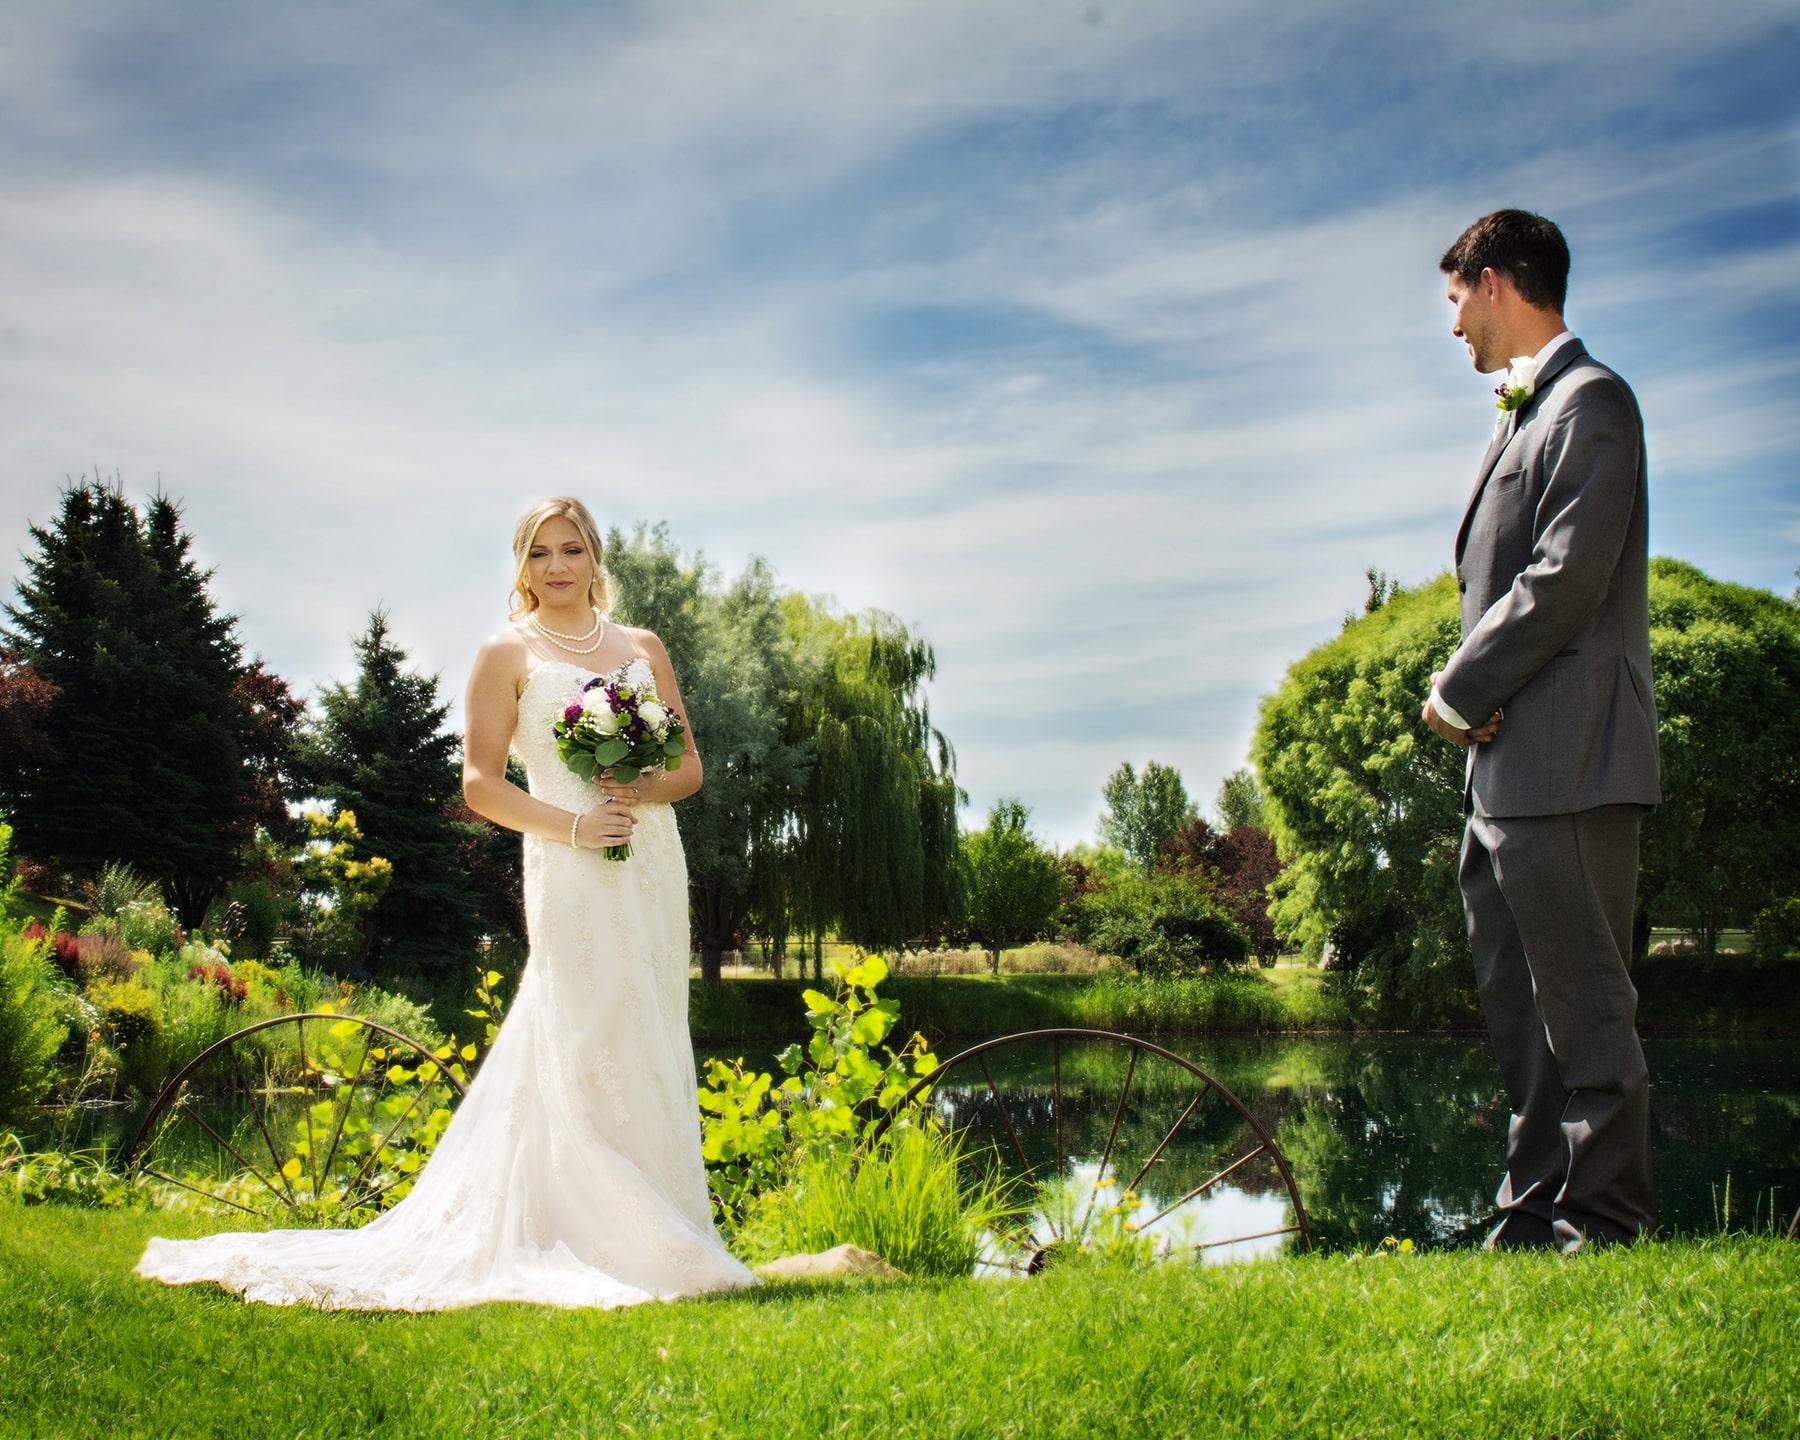 Honalee Farm Eagle Idaho beautiful bride